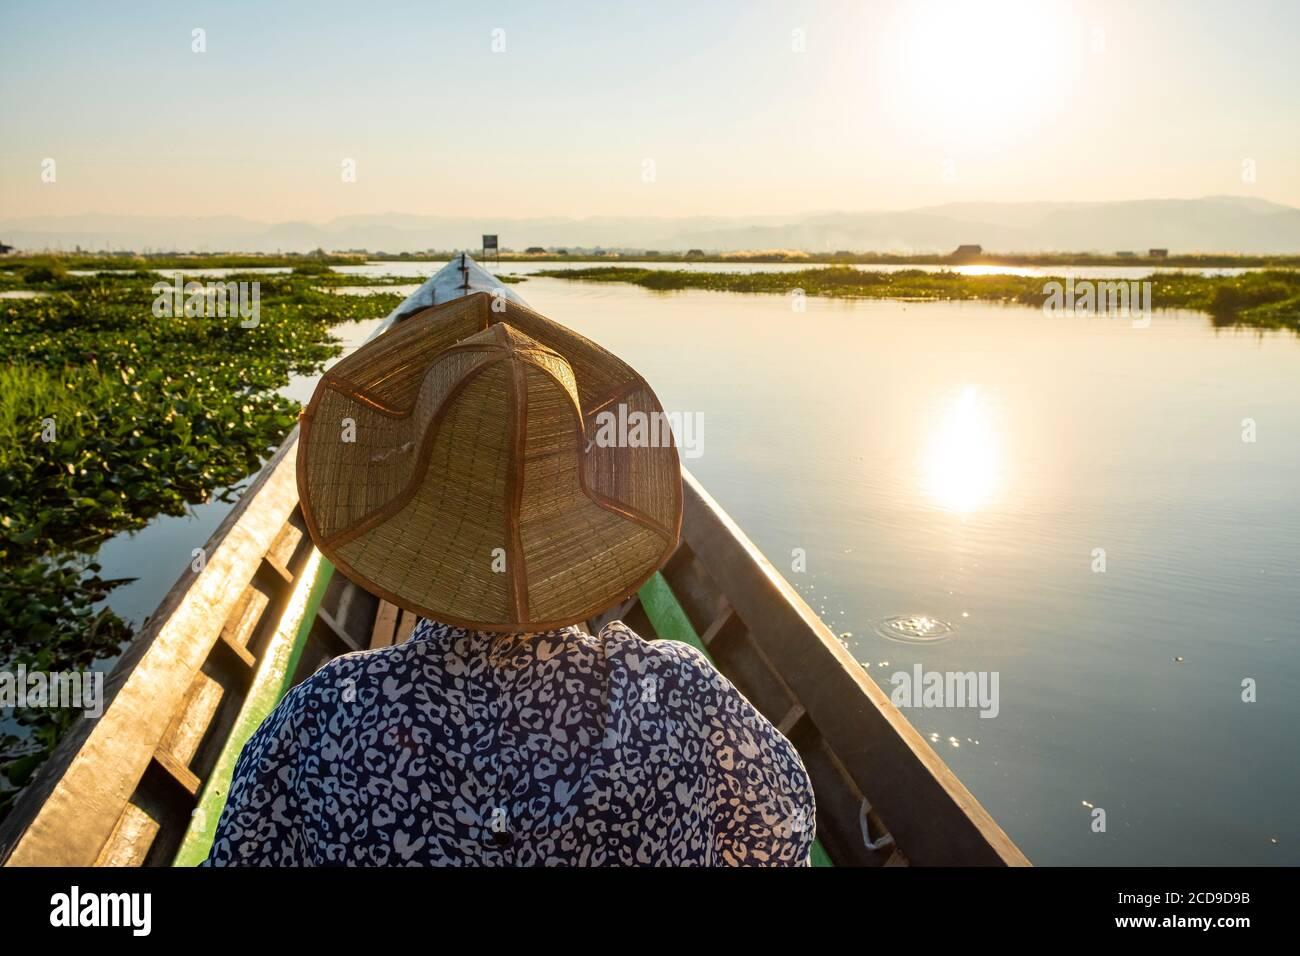 Myanmar (Birmania), Stato di Shan, Lago Inle, gita in barca Foto Stock